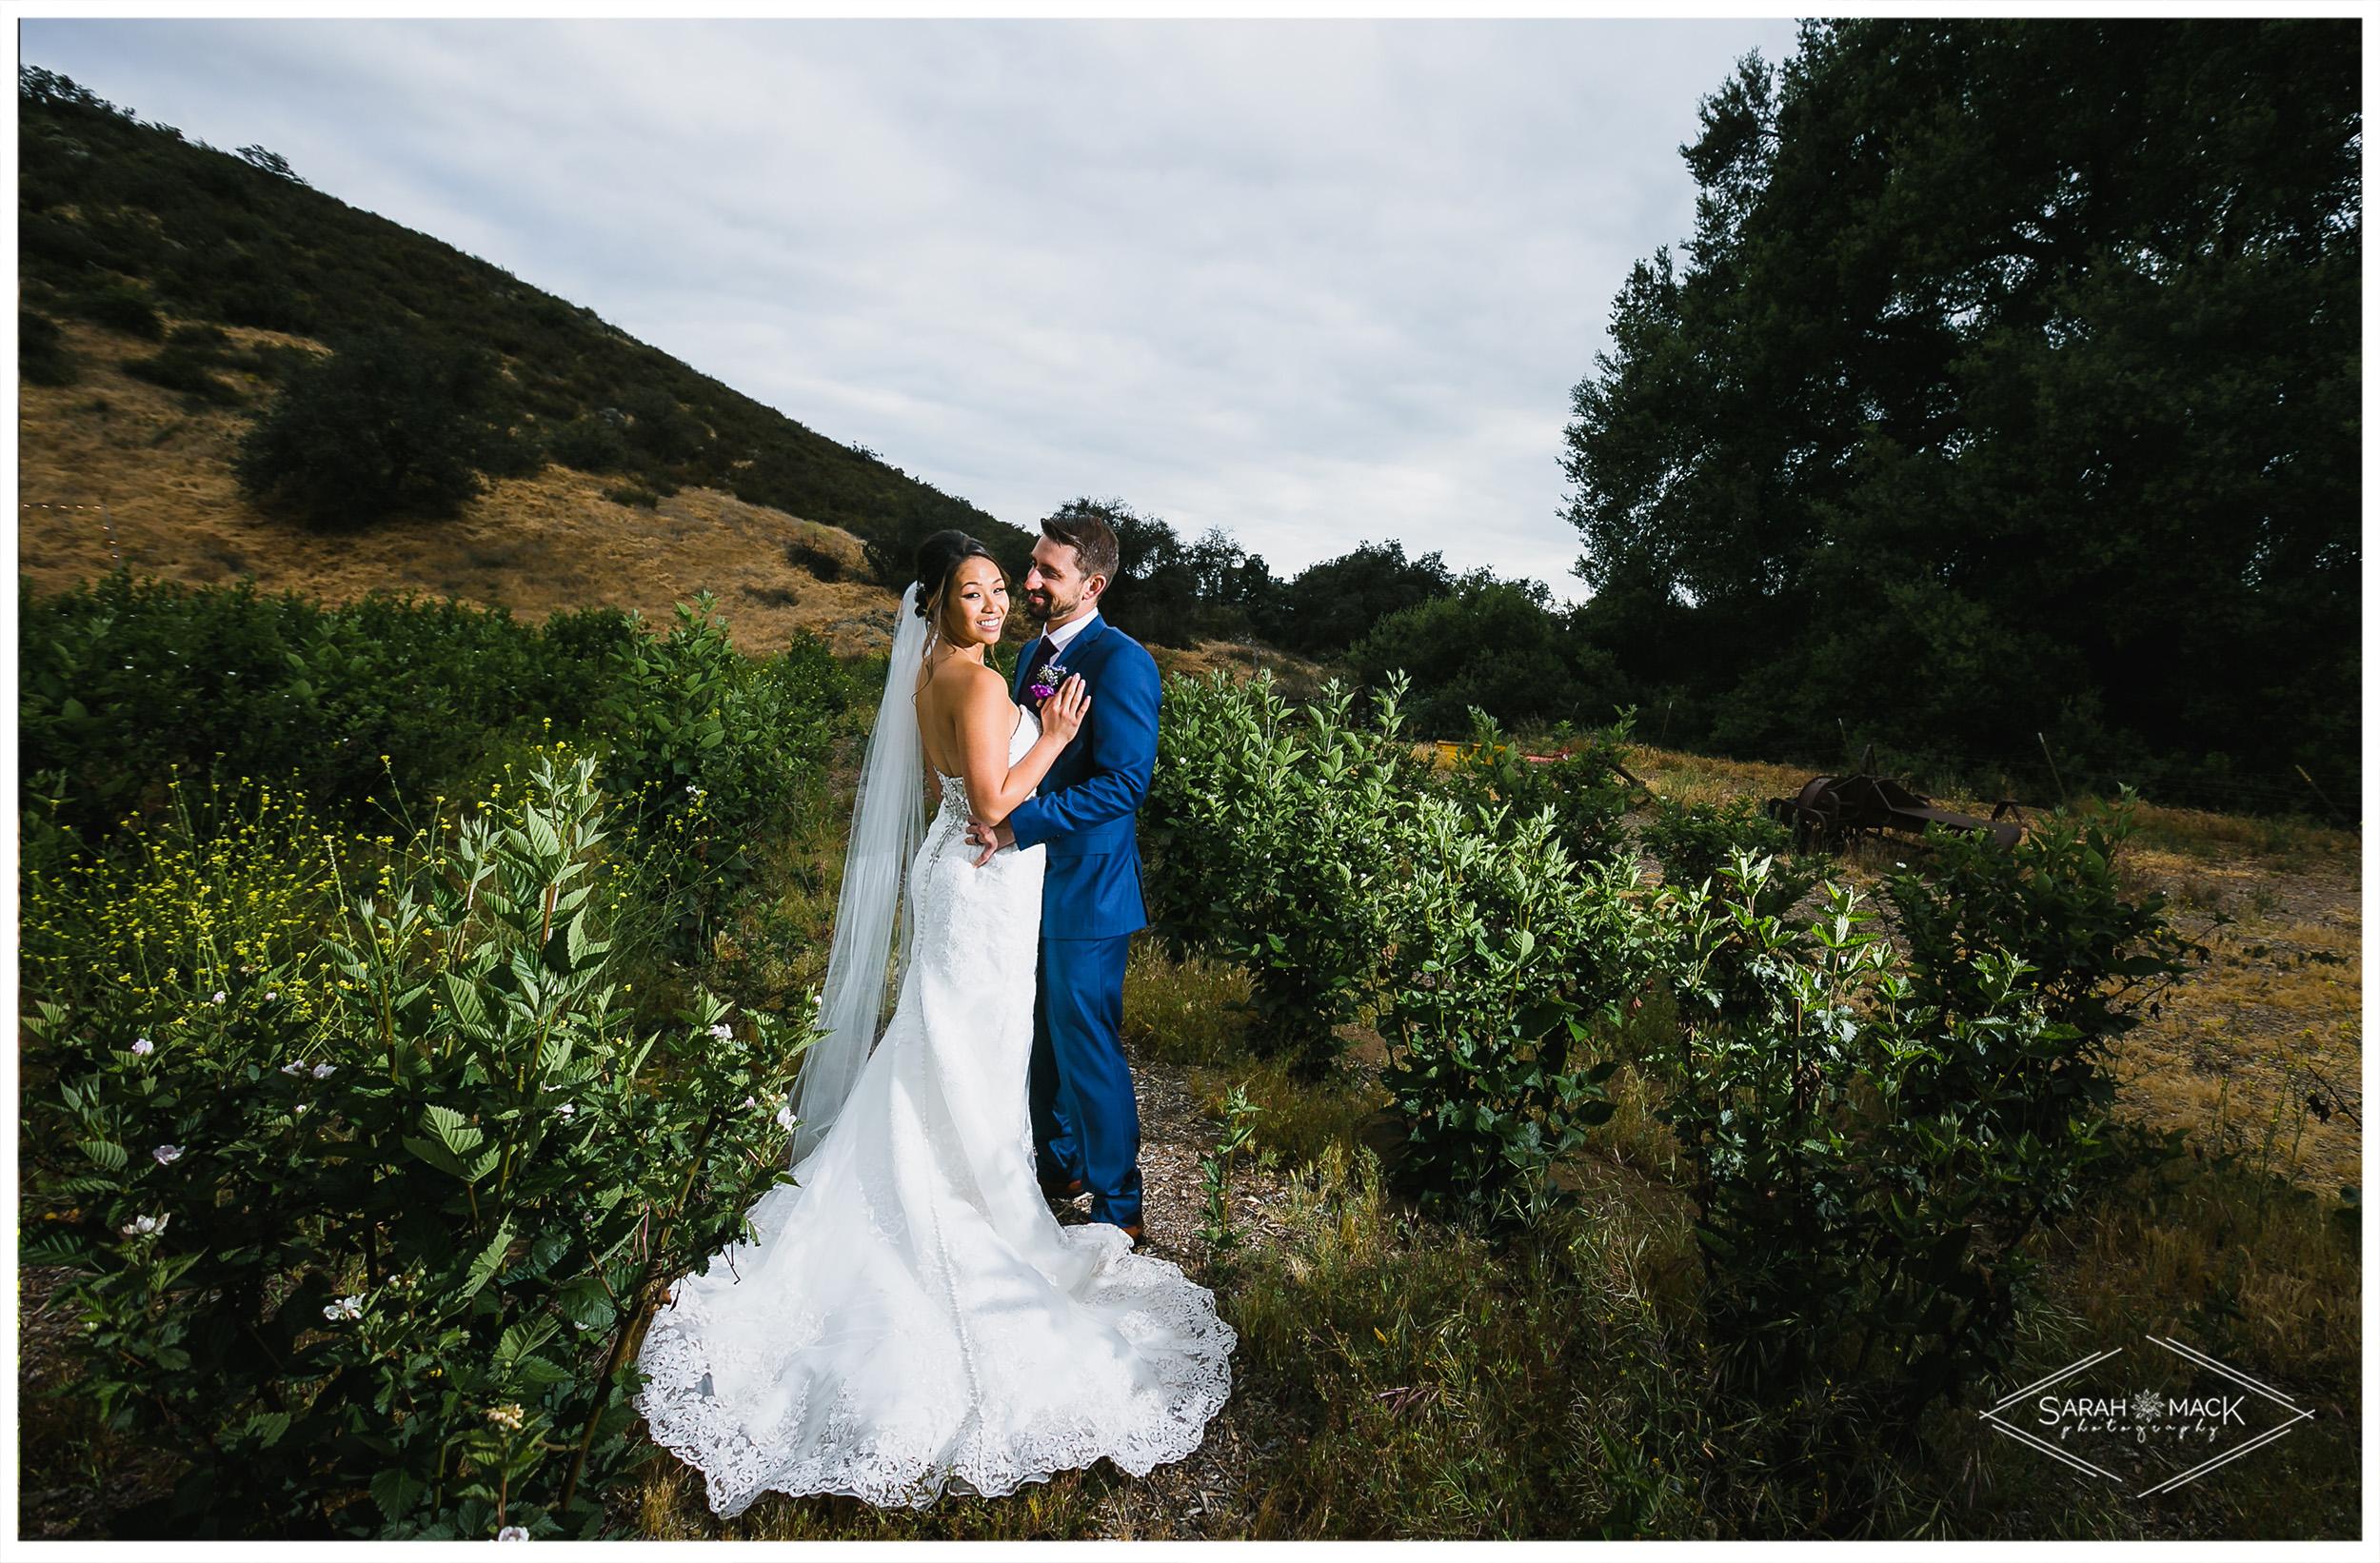 PG-Owl-Creek-Farms-Temecula-Wedding-Photography-50.jpg